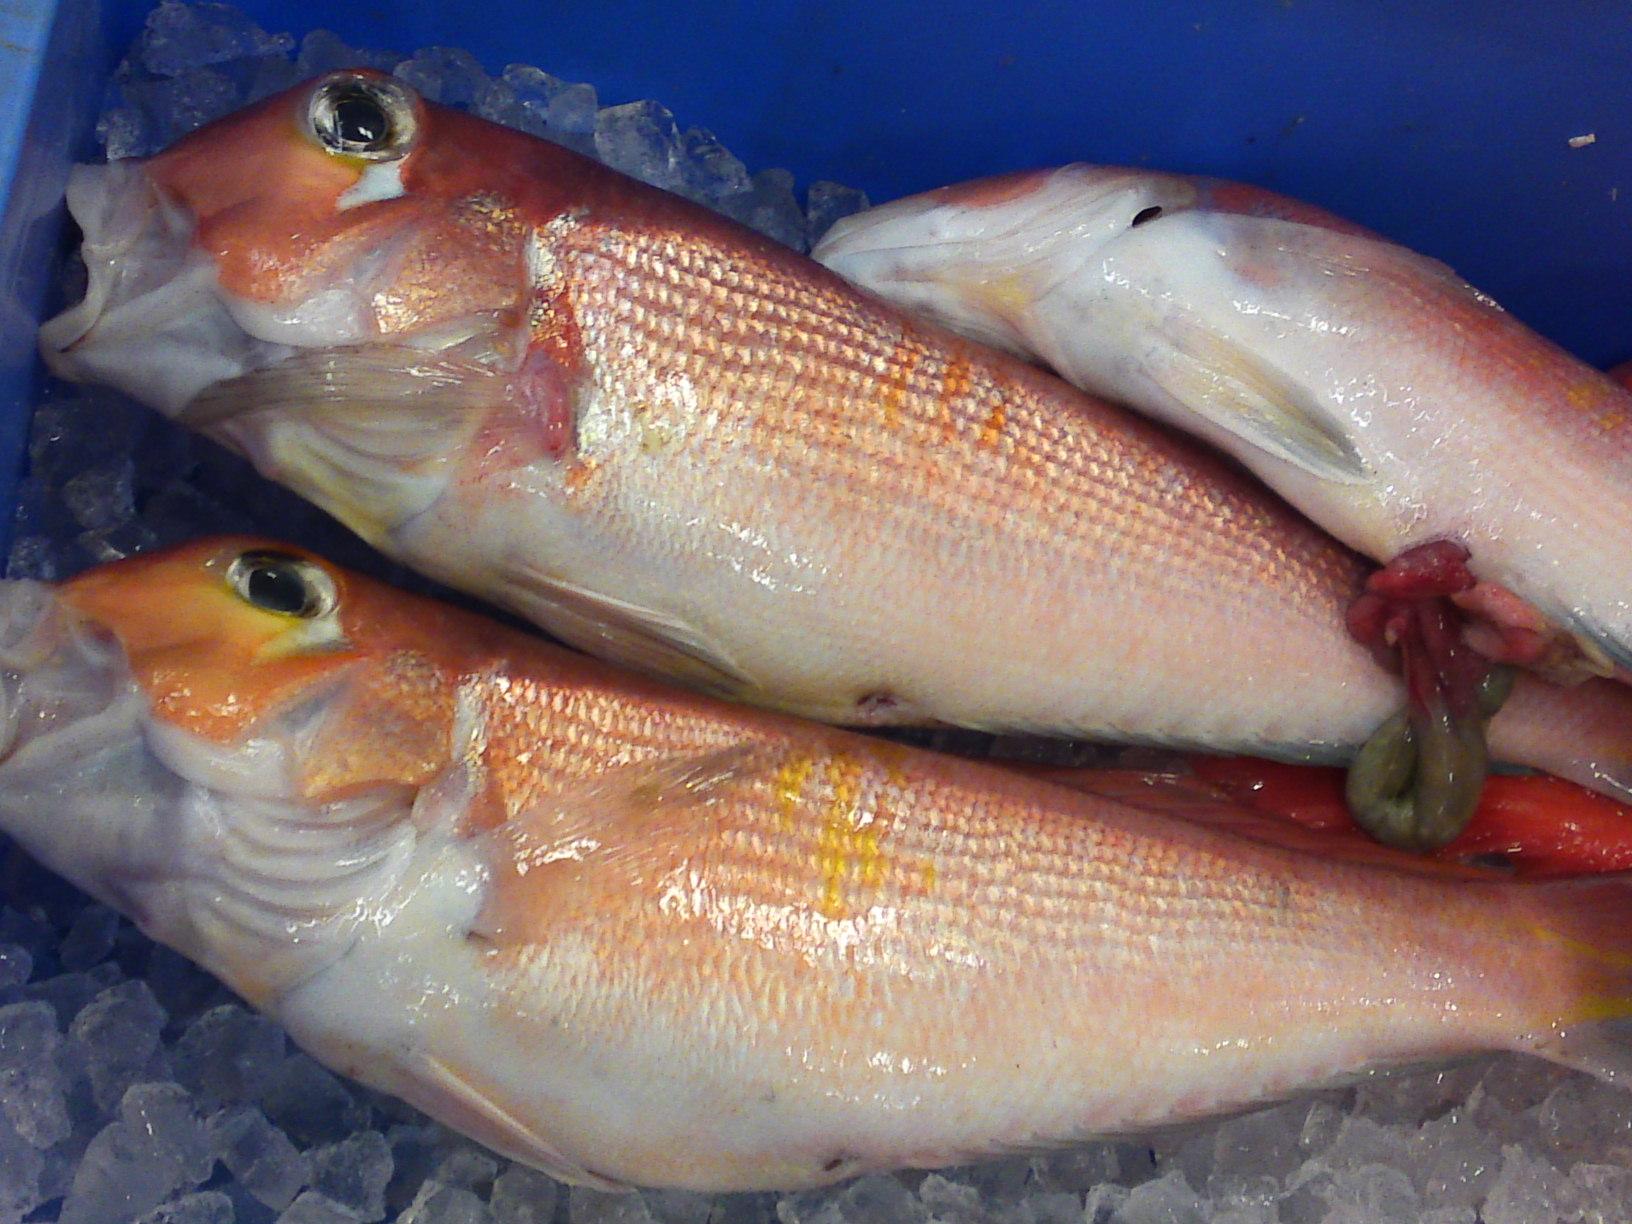 Seabream shizuoka sushi sashimi the other jewels of japan for Kumak s fish